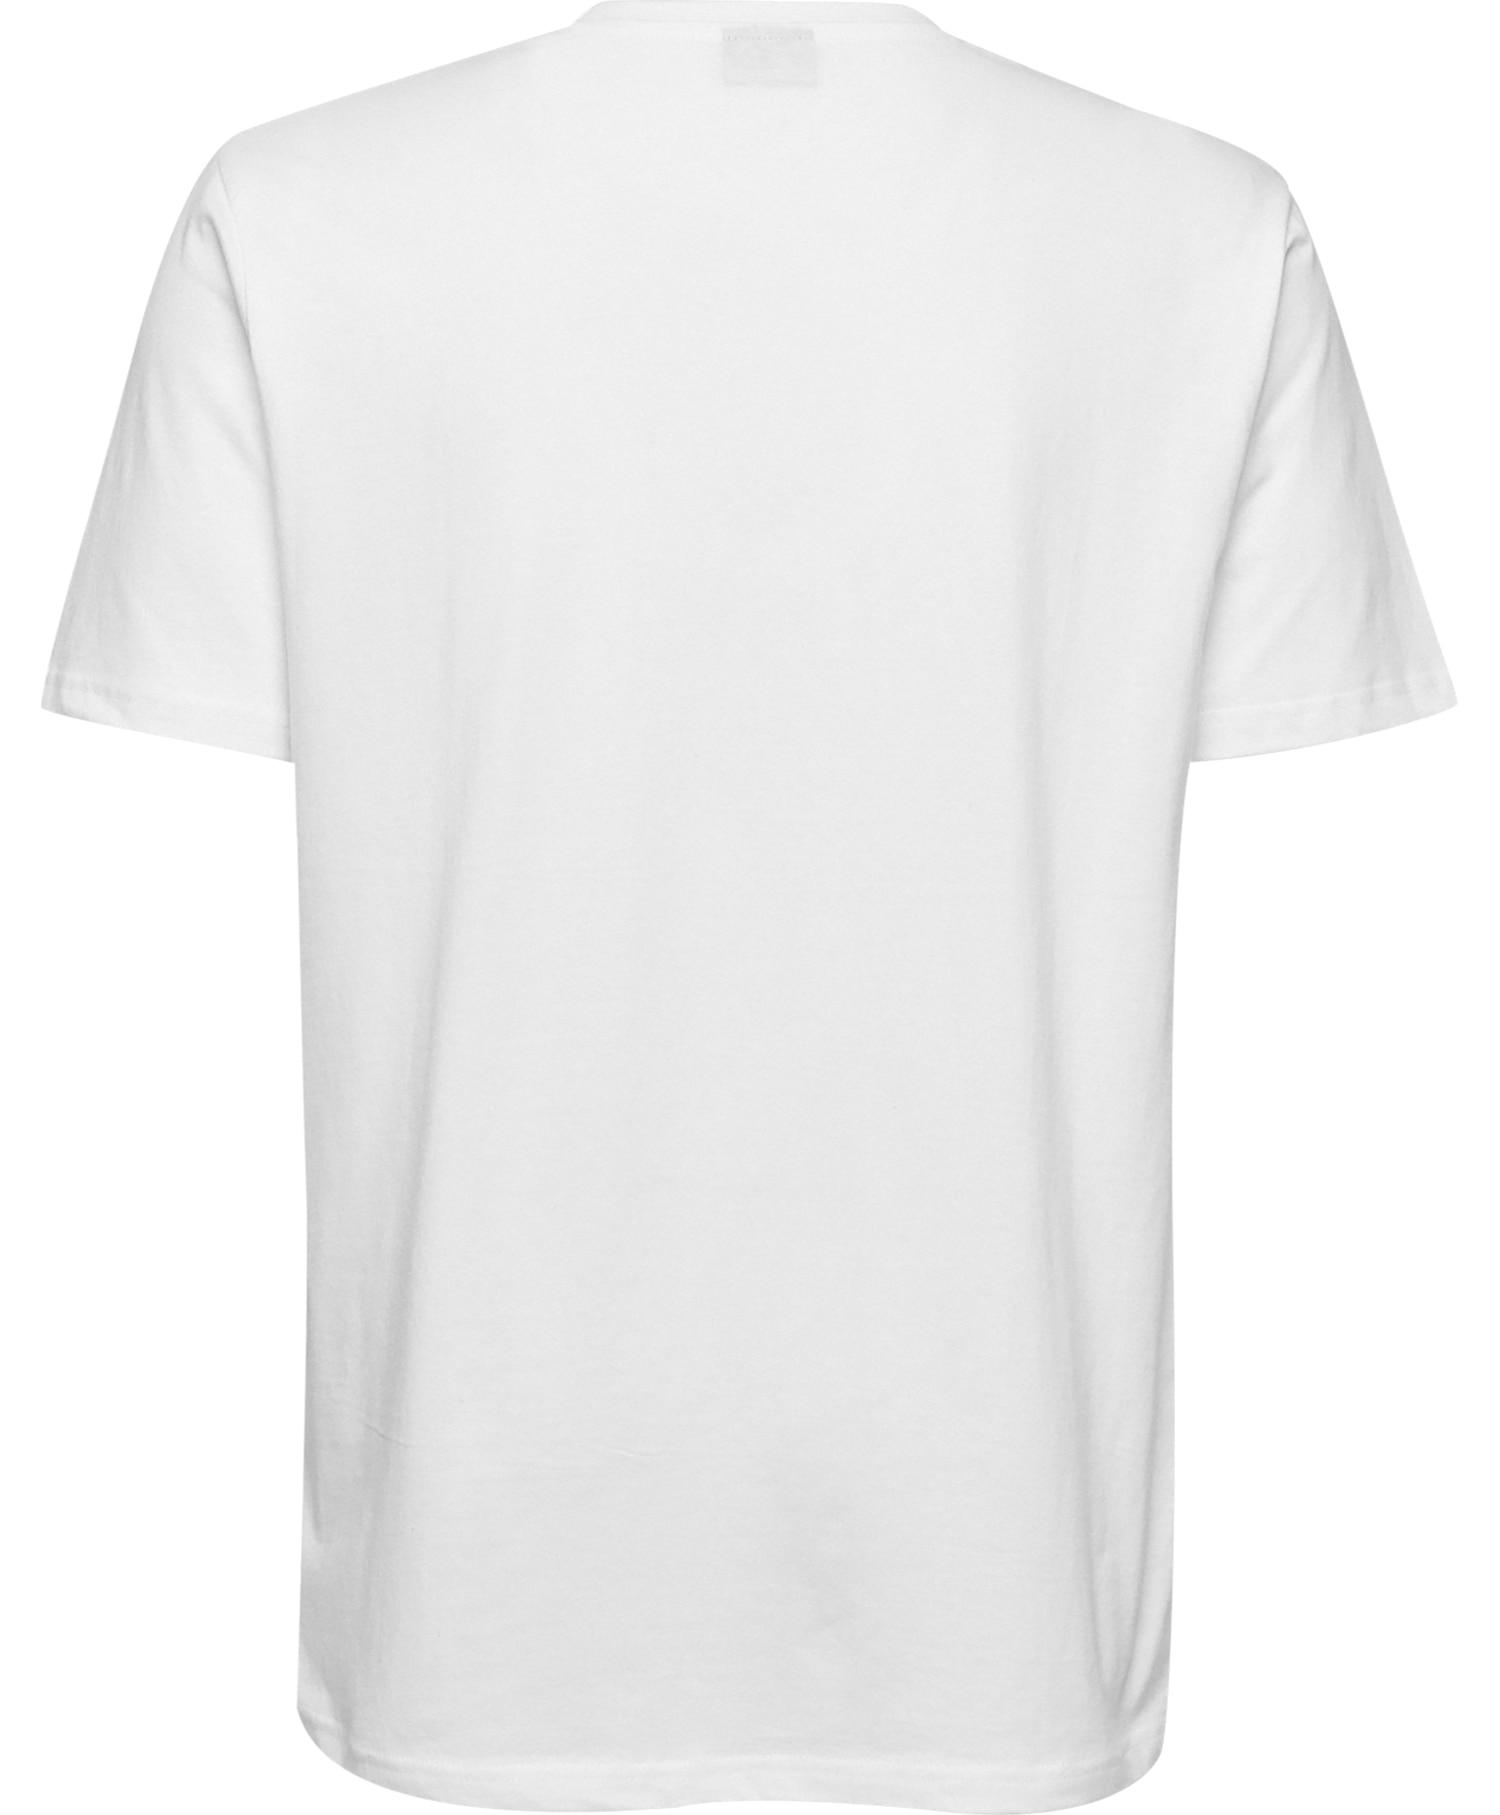 Hummel cotton logo tee